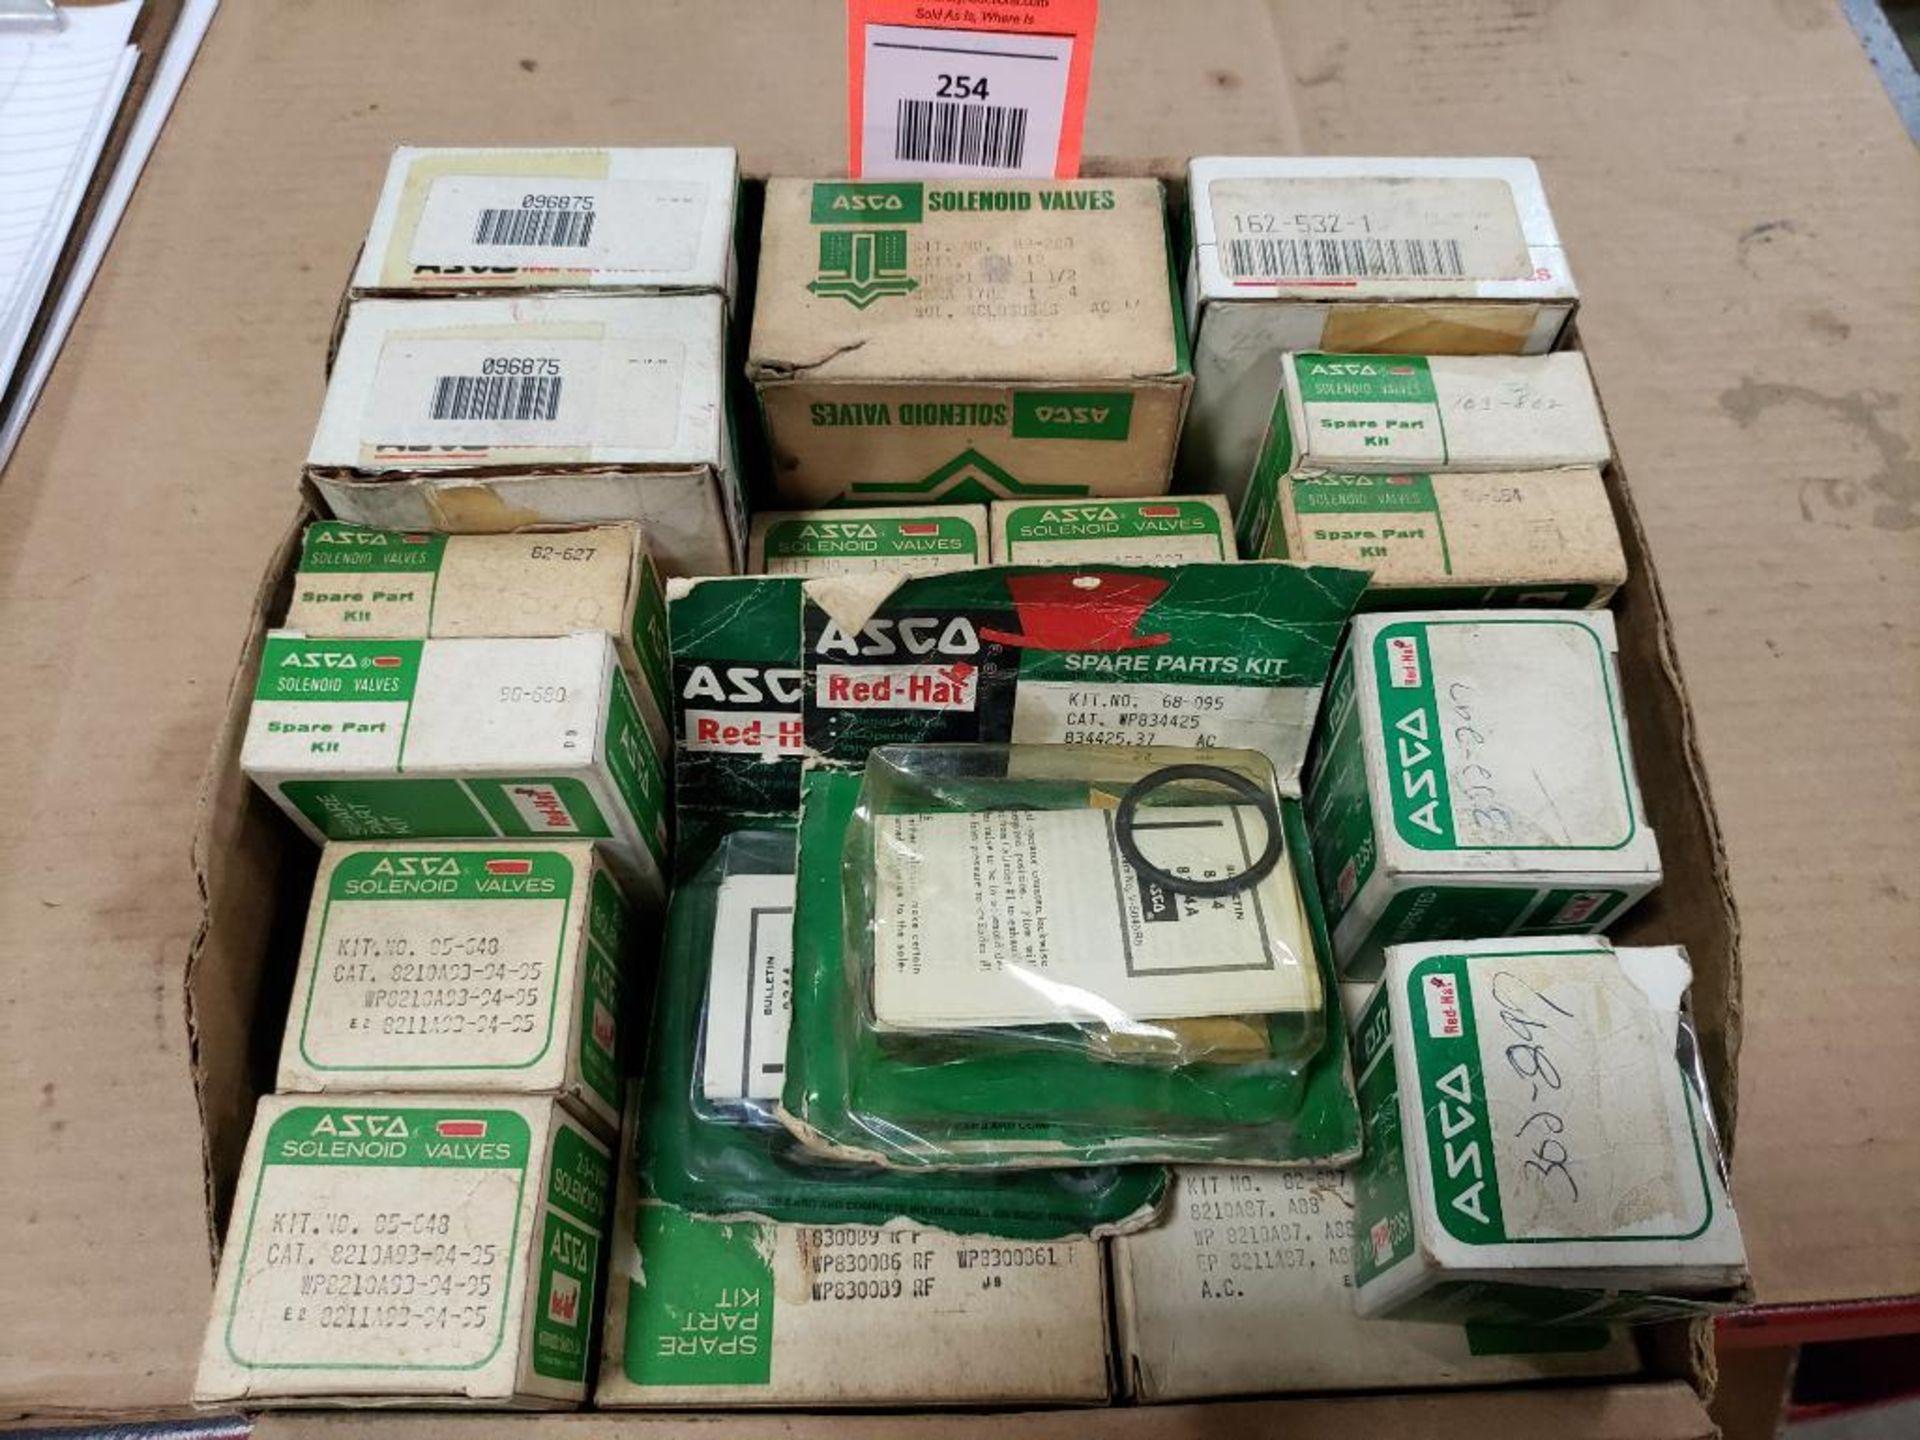 Assorted solenoid valves, and repair kits. Asco.